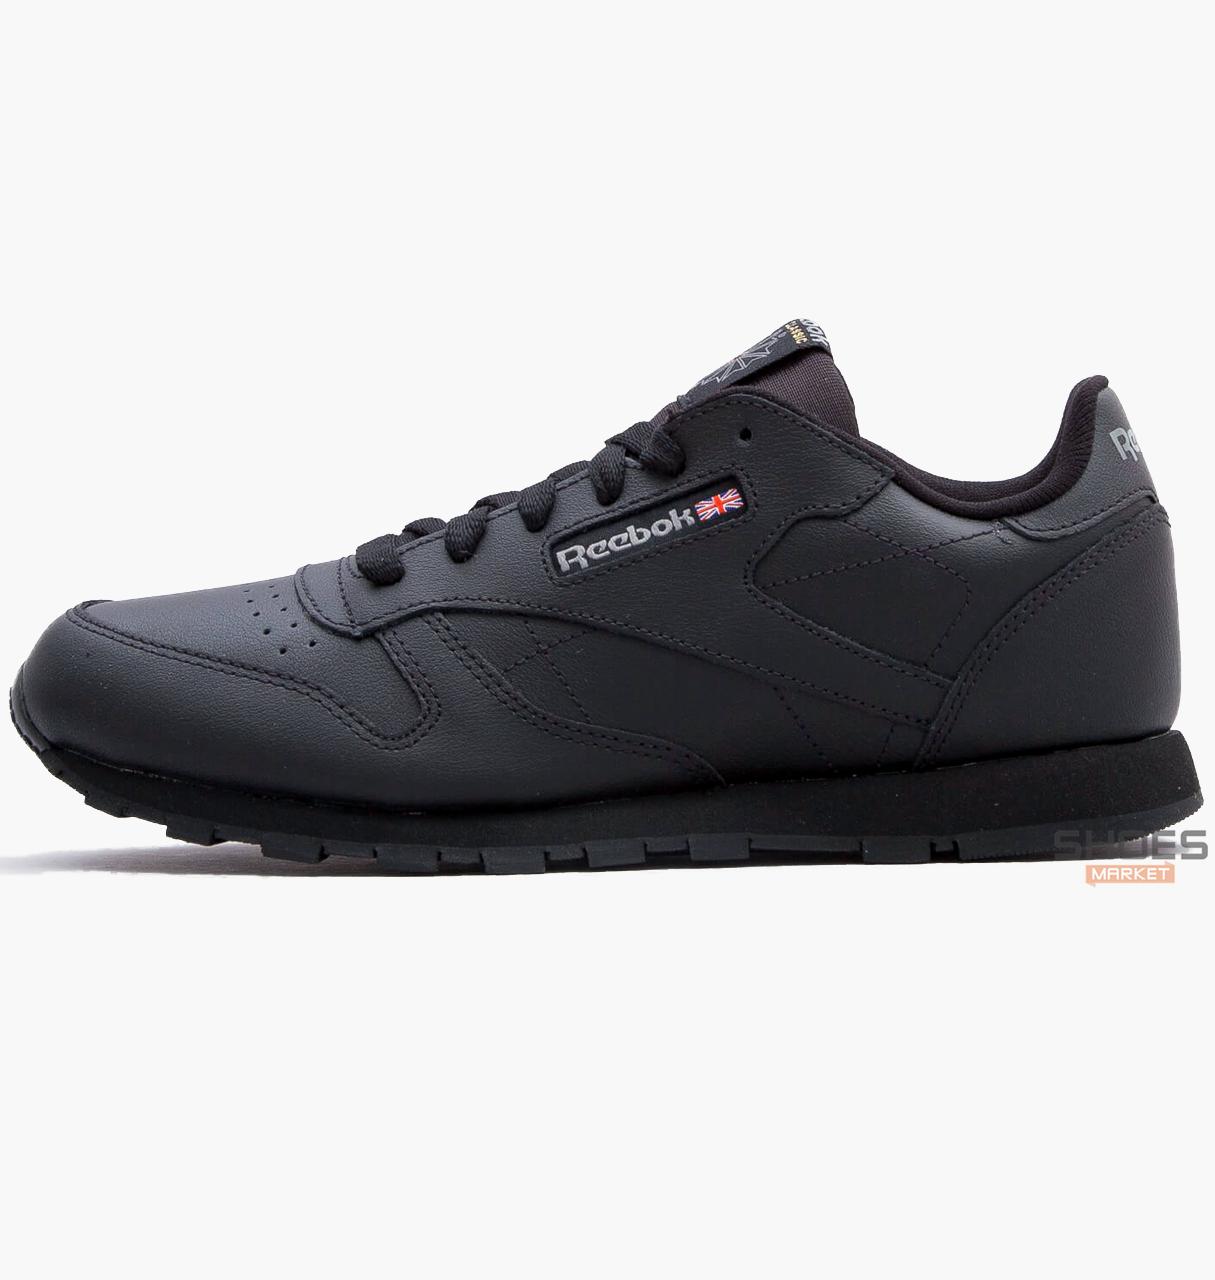 Женские кроссовки Reebok Classic Leather Black 50149, оригинал